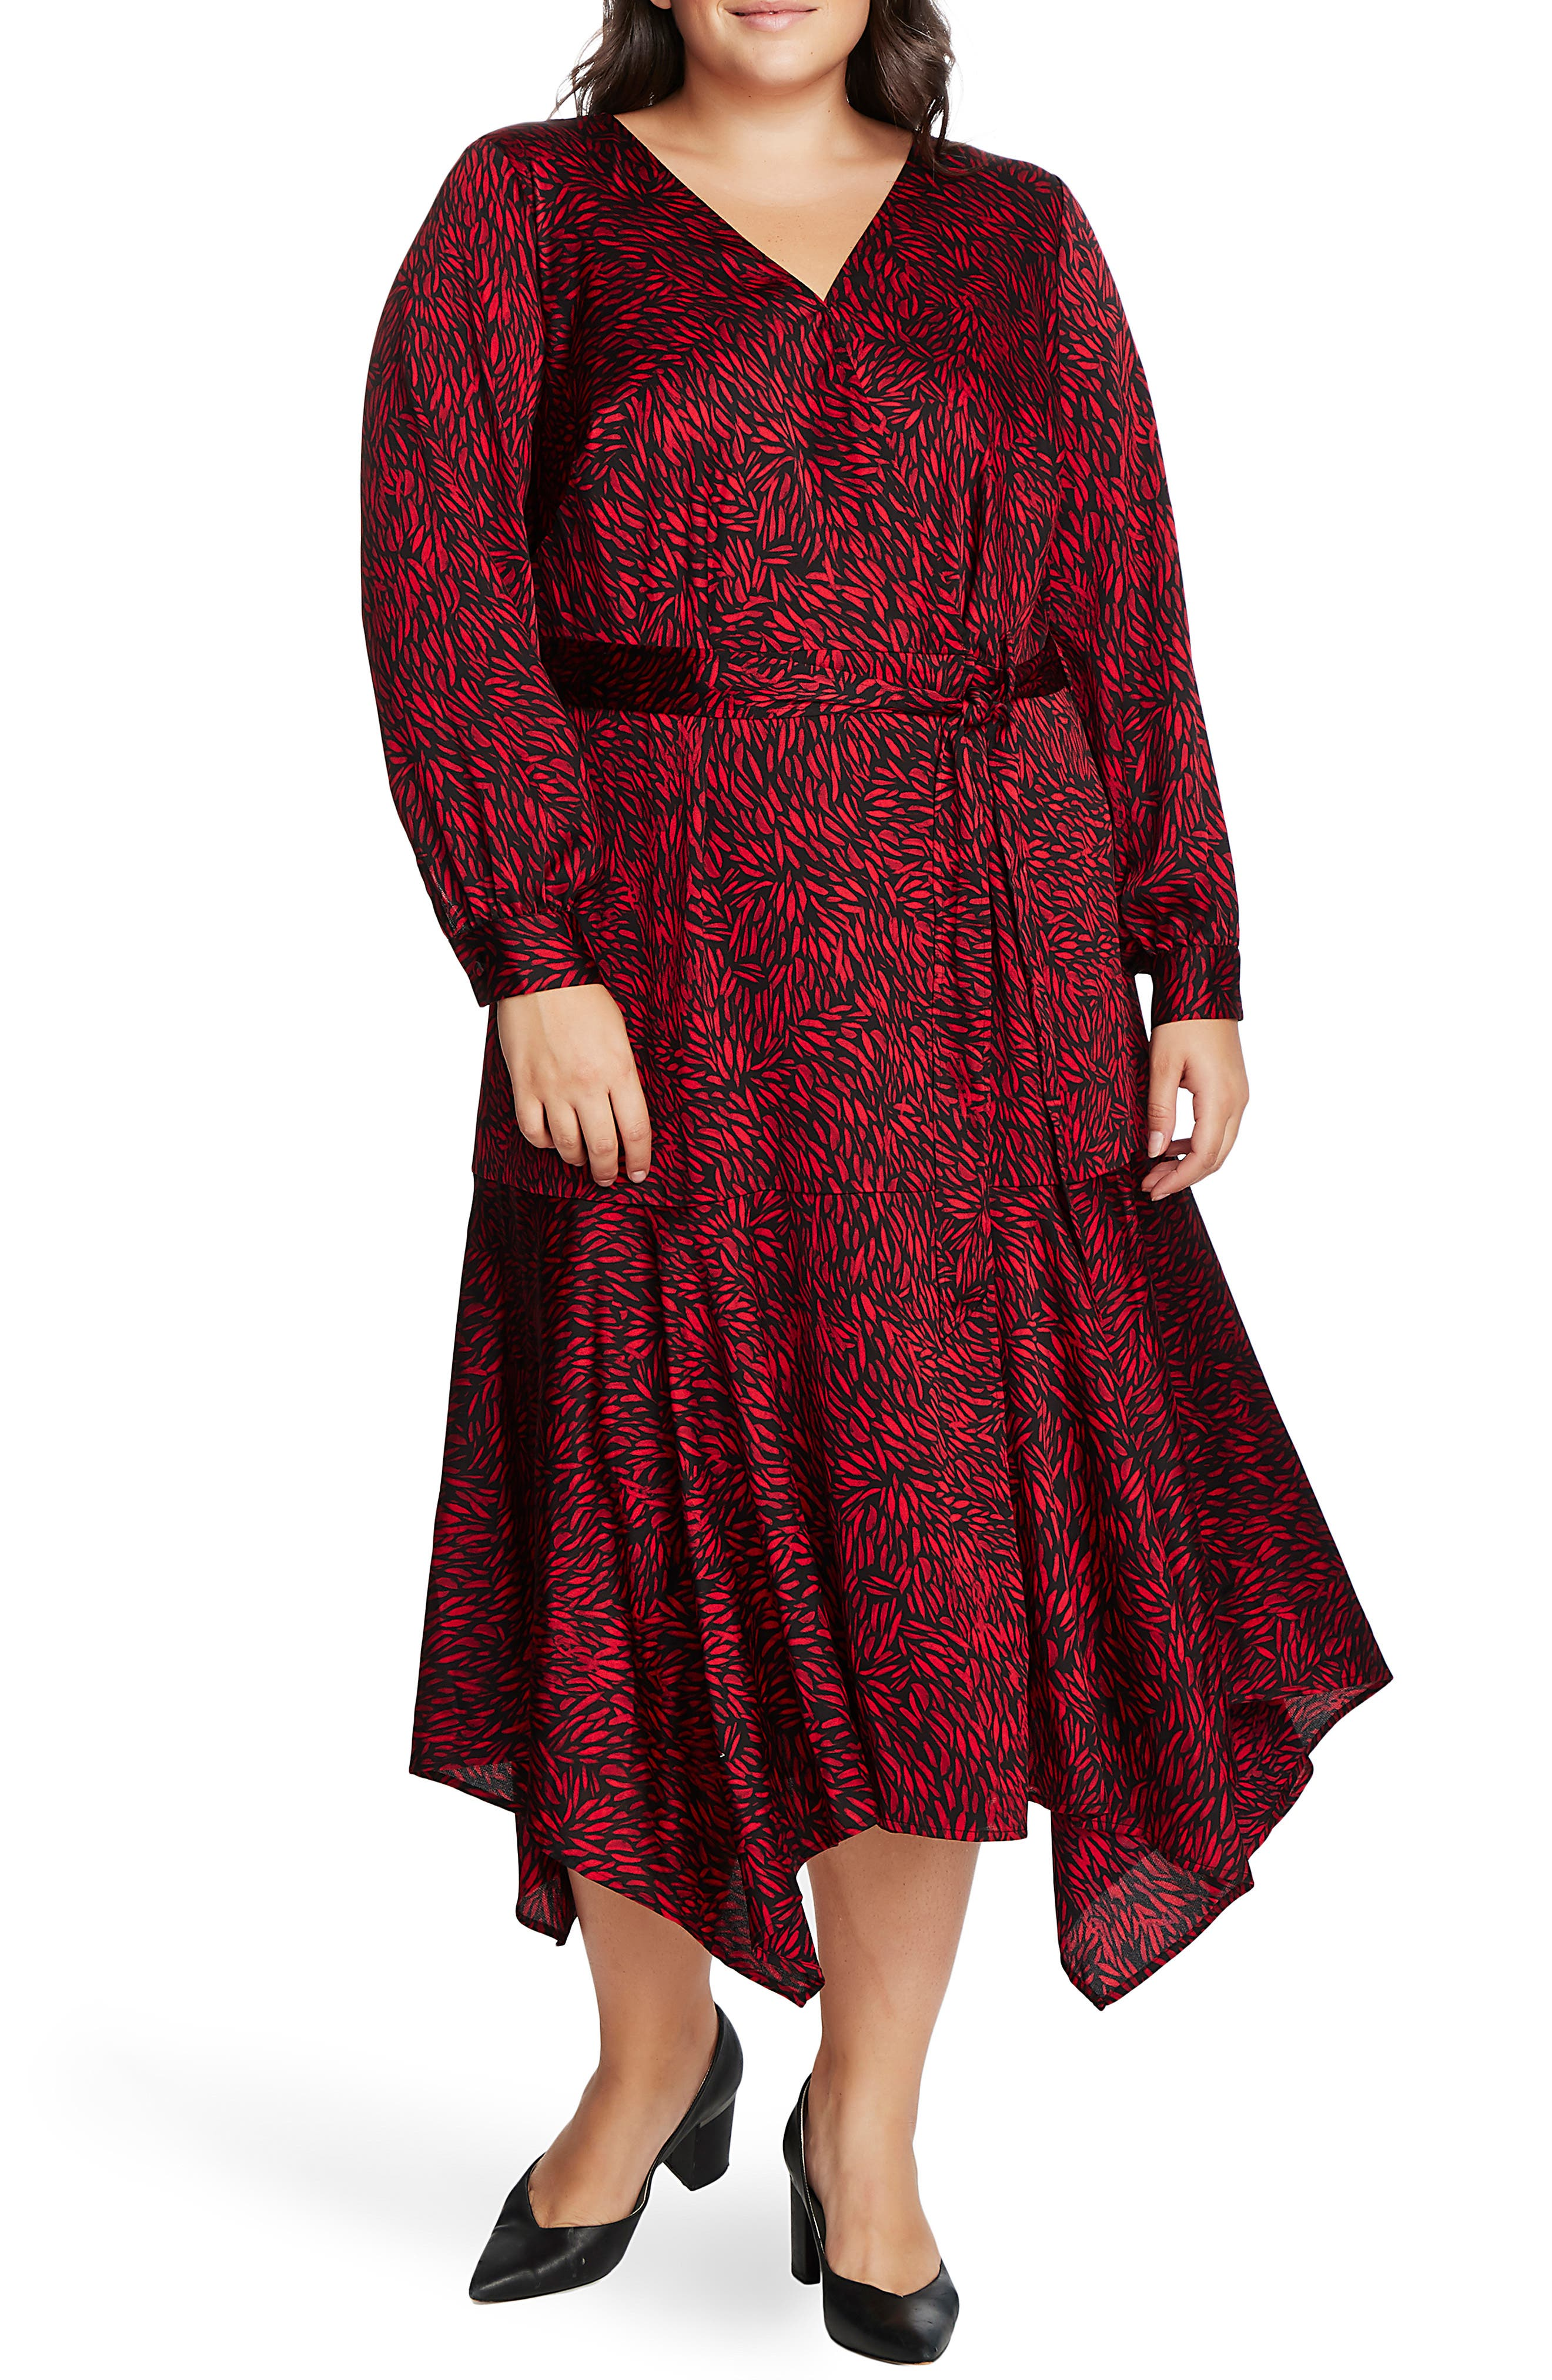 Vintage 1920s Dresses – Where to Buy Plus Size Womens Vince Camuto Petal Print Asymmetrical Hem Dress Size 3X - Red $179.00 AT vintagedancer.com